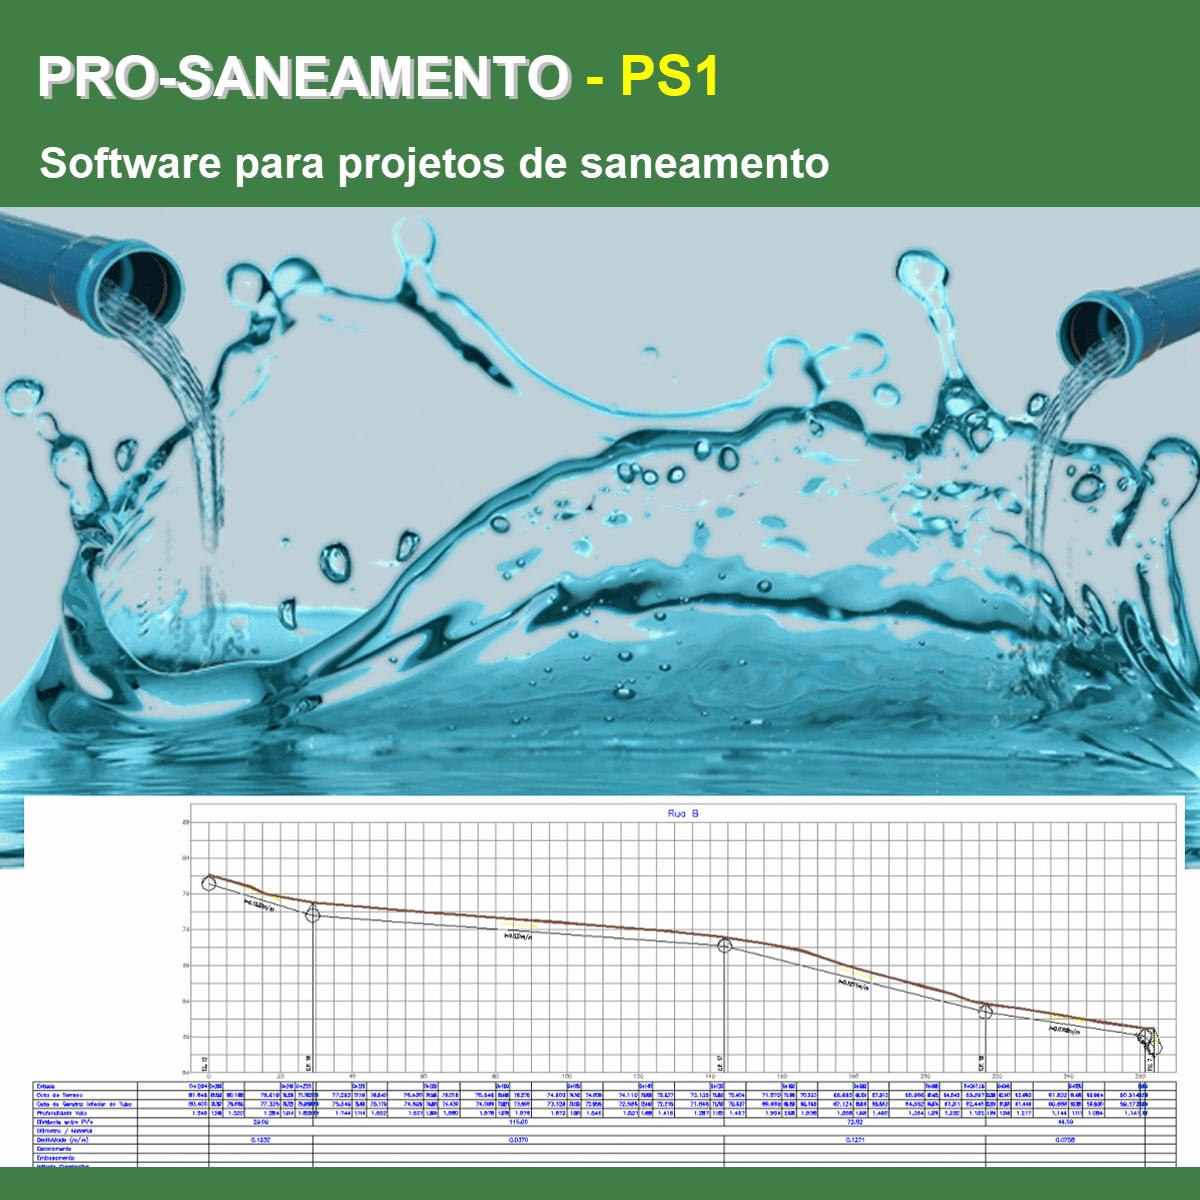 Software PRO-Saneamento versão 18 Pacote PS1  - MULTIPLUS SOFTWARES